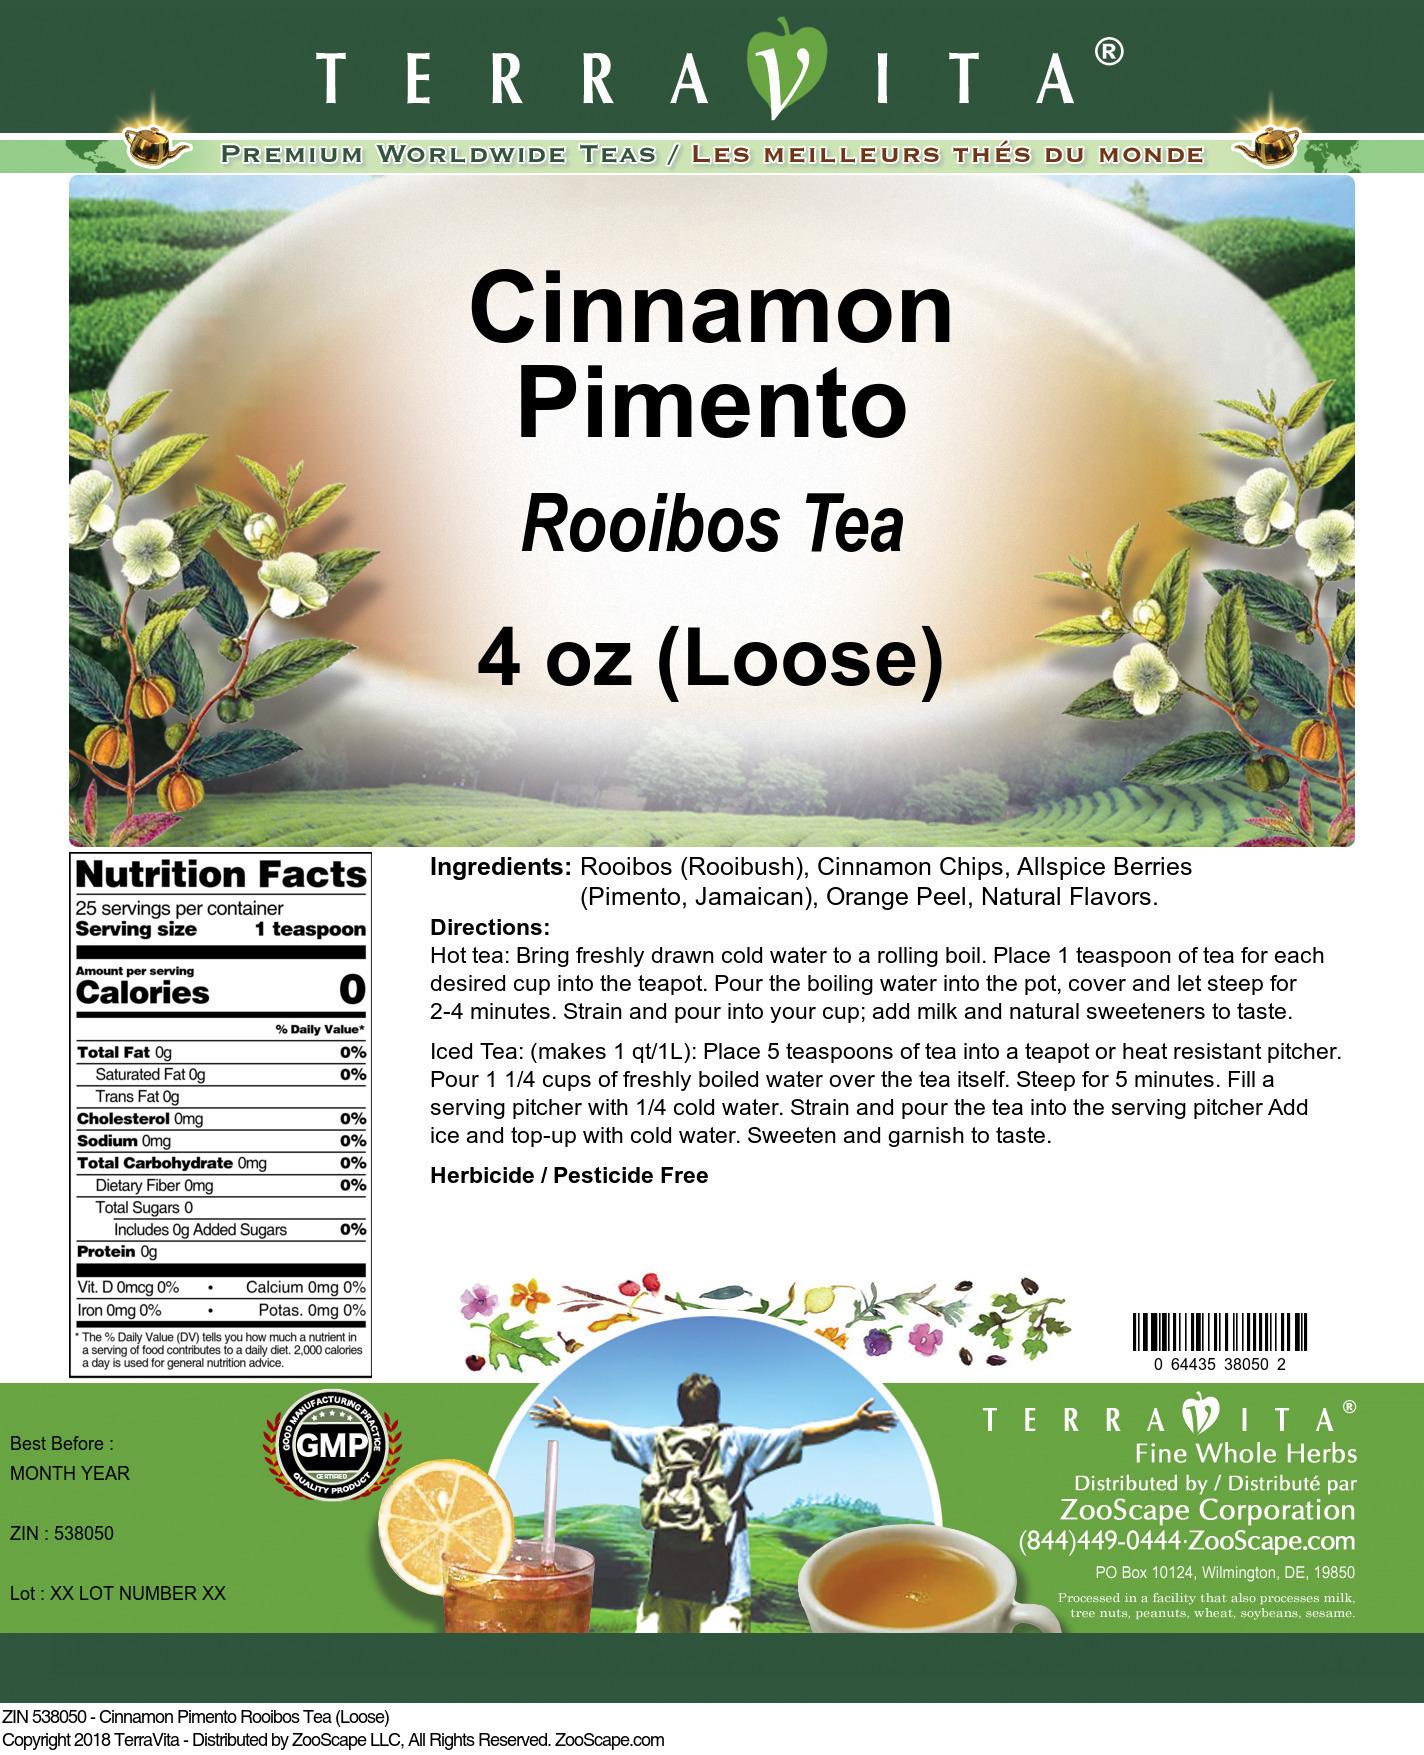 Cinnamon Pimento Rooibos Tea (Loose)